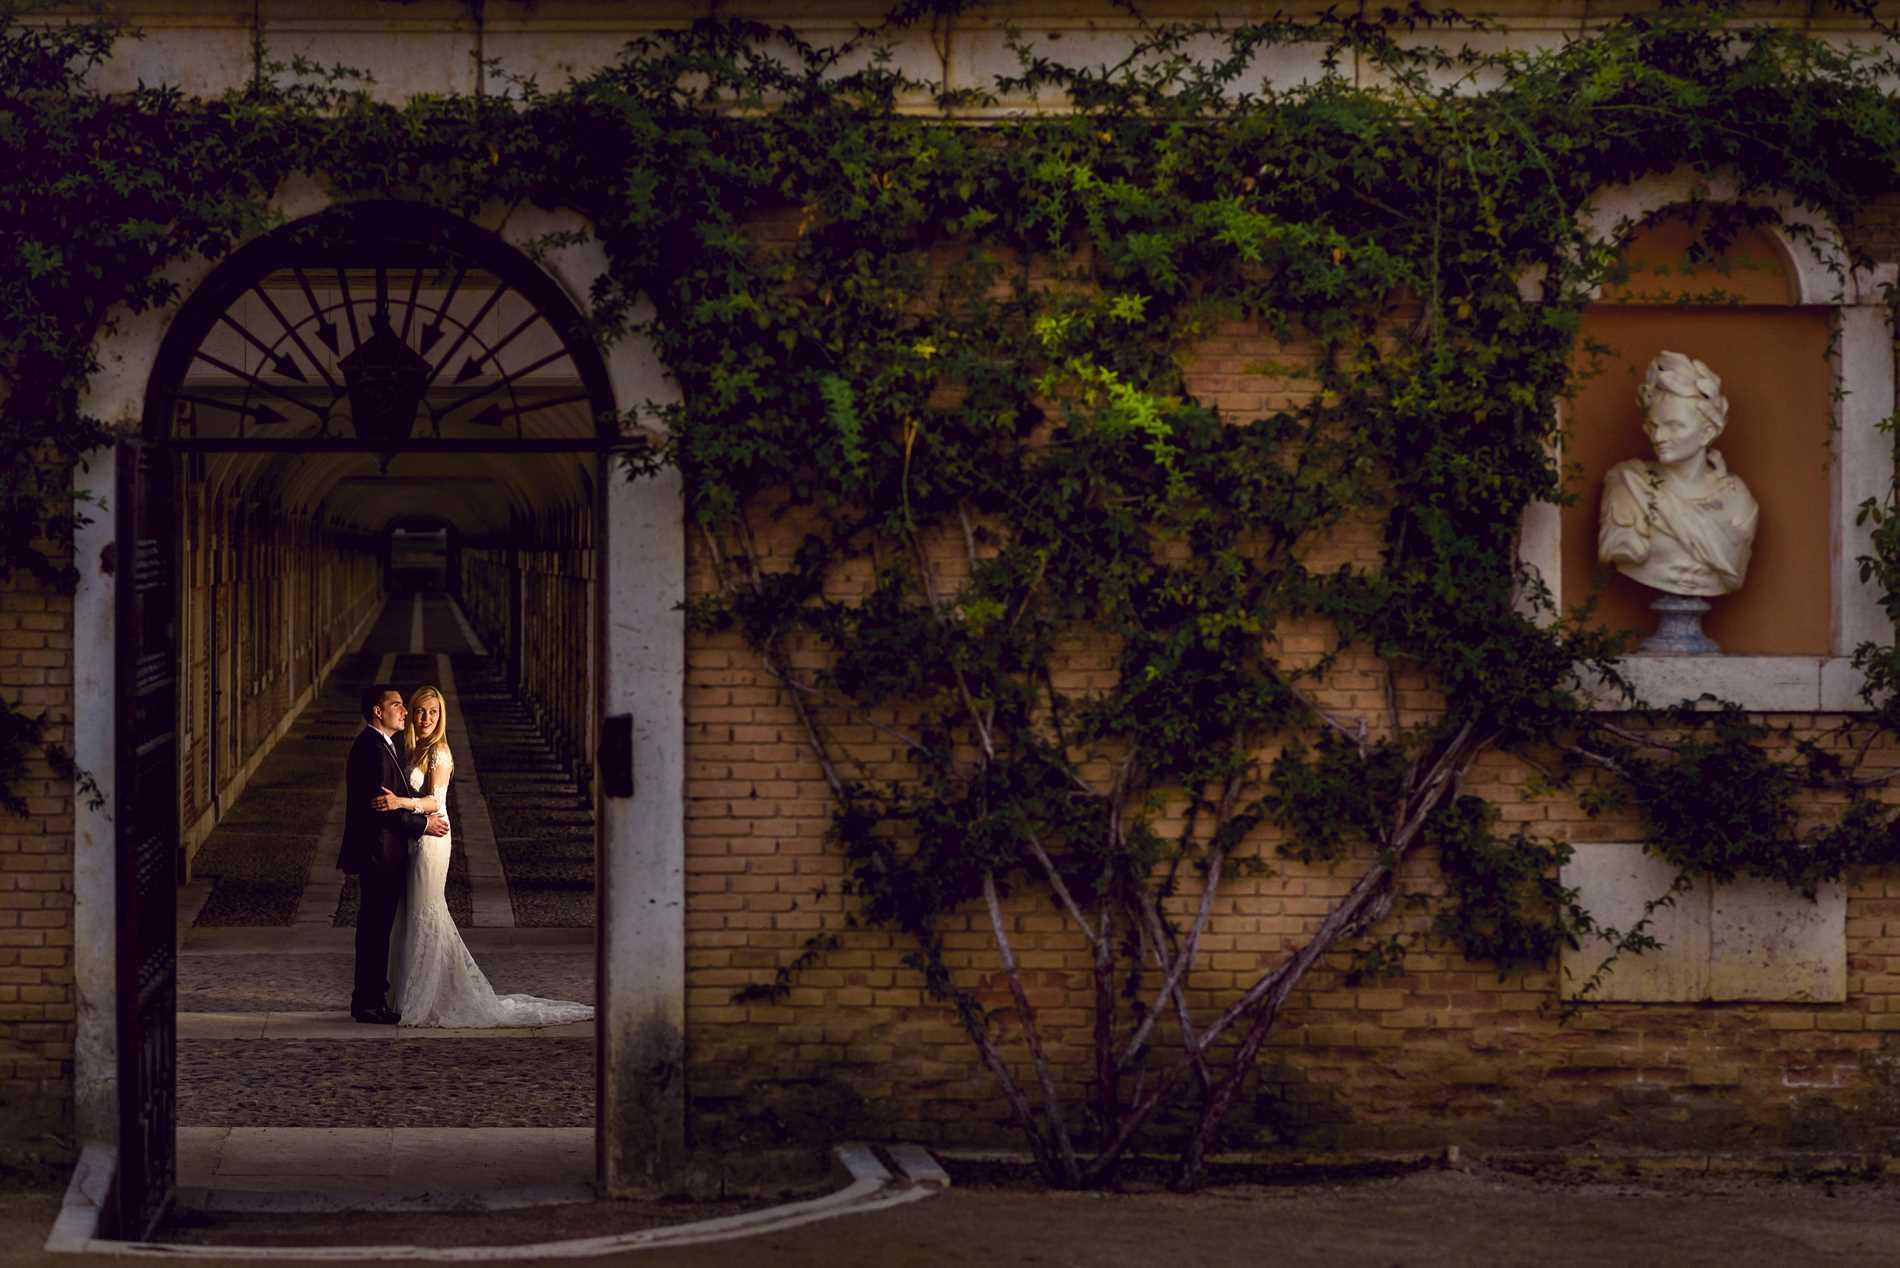 fotógrafo de bodas en Aranjuez